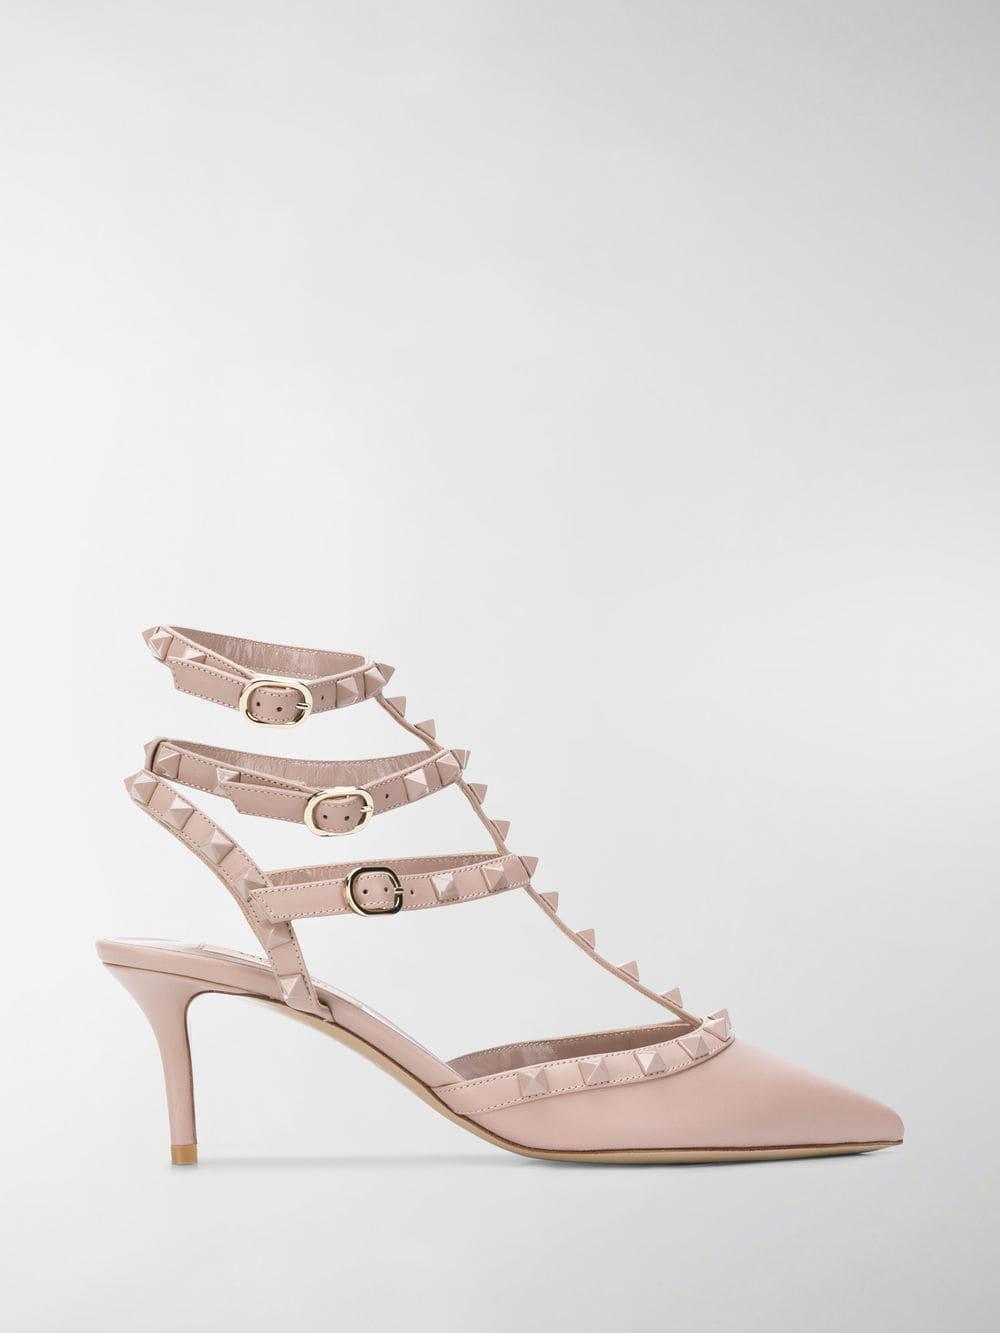 8991568c94c6 Valentino. Women s Pink Garavani Rockstud Court Shoes